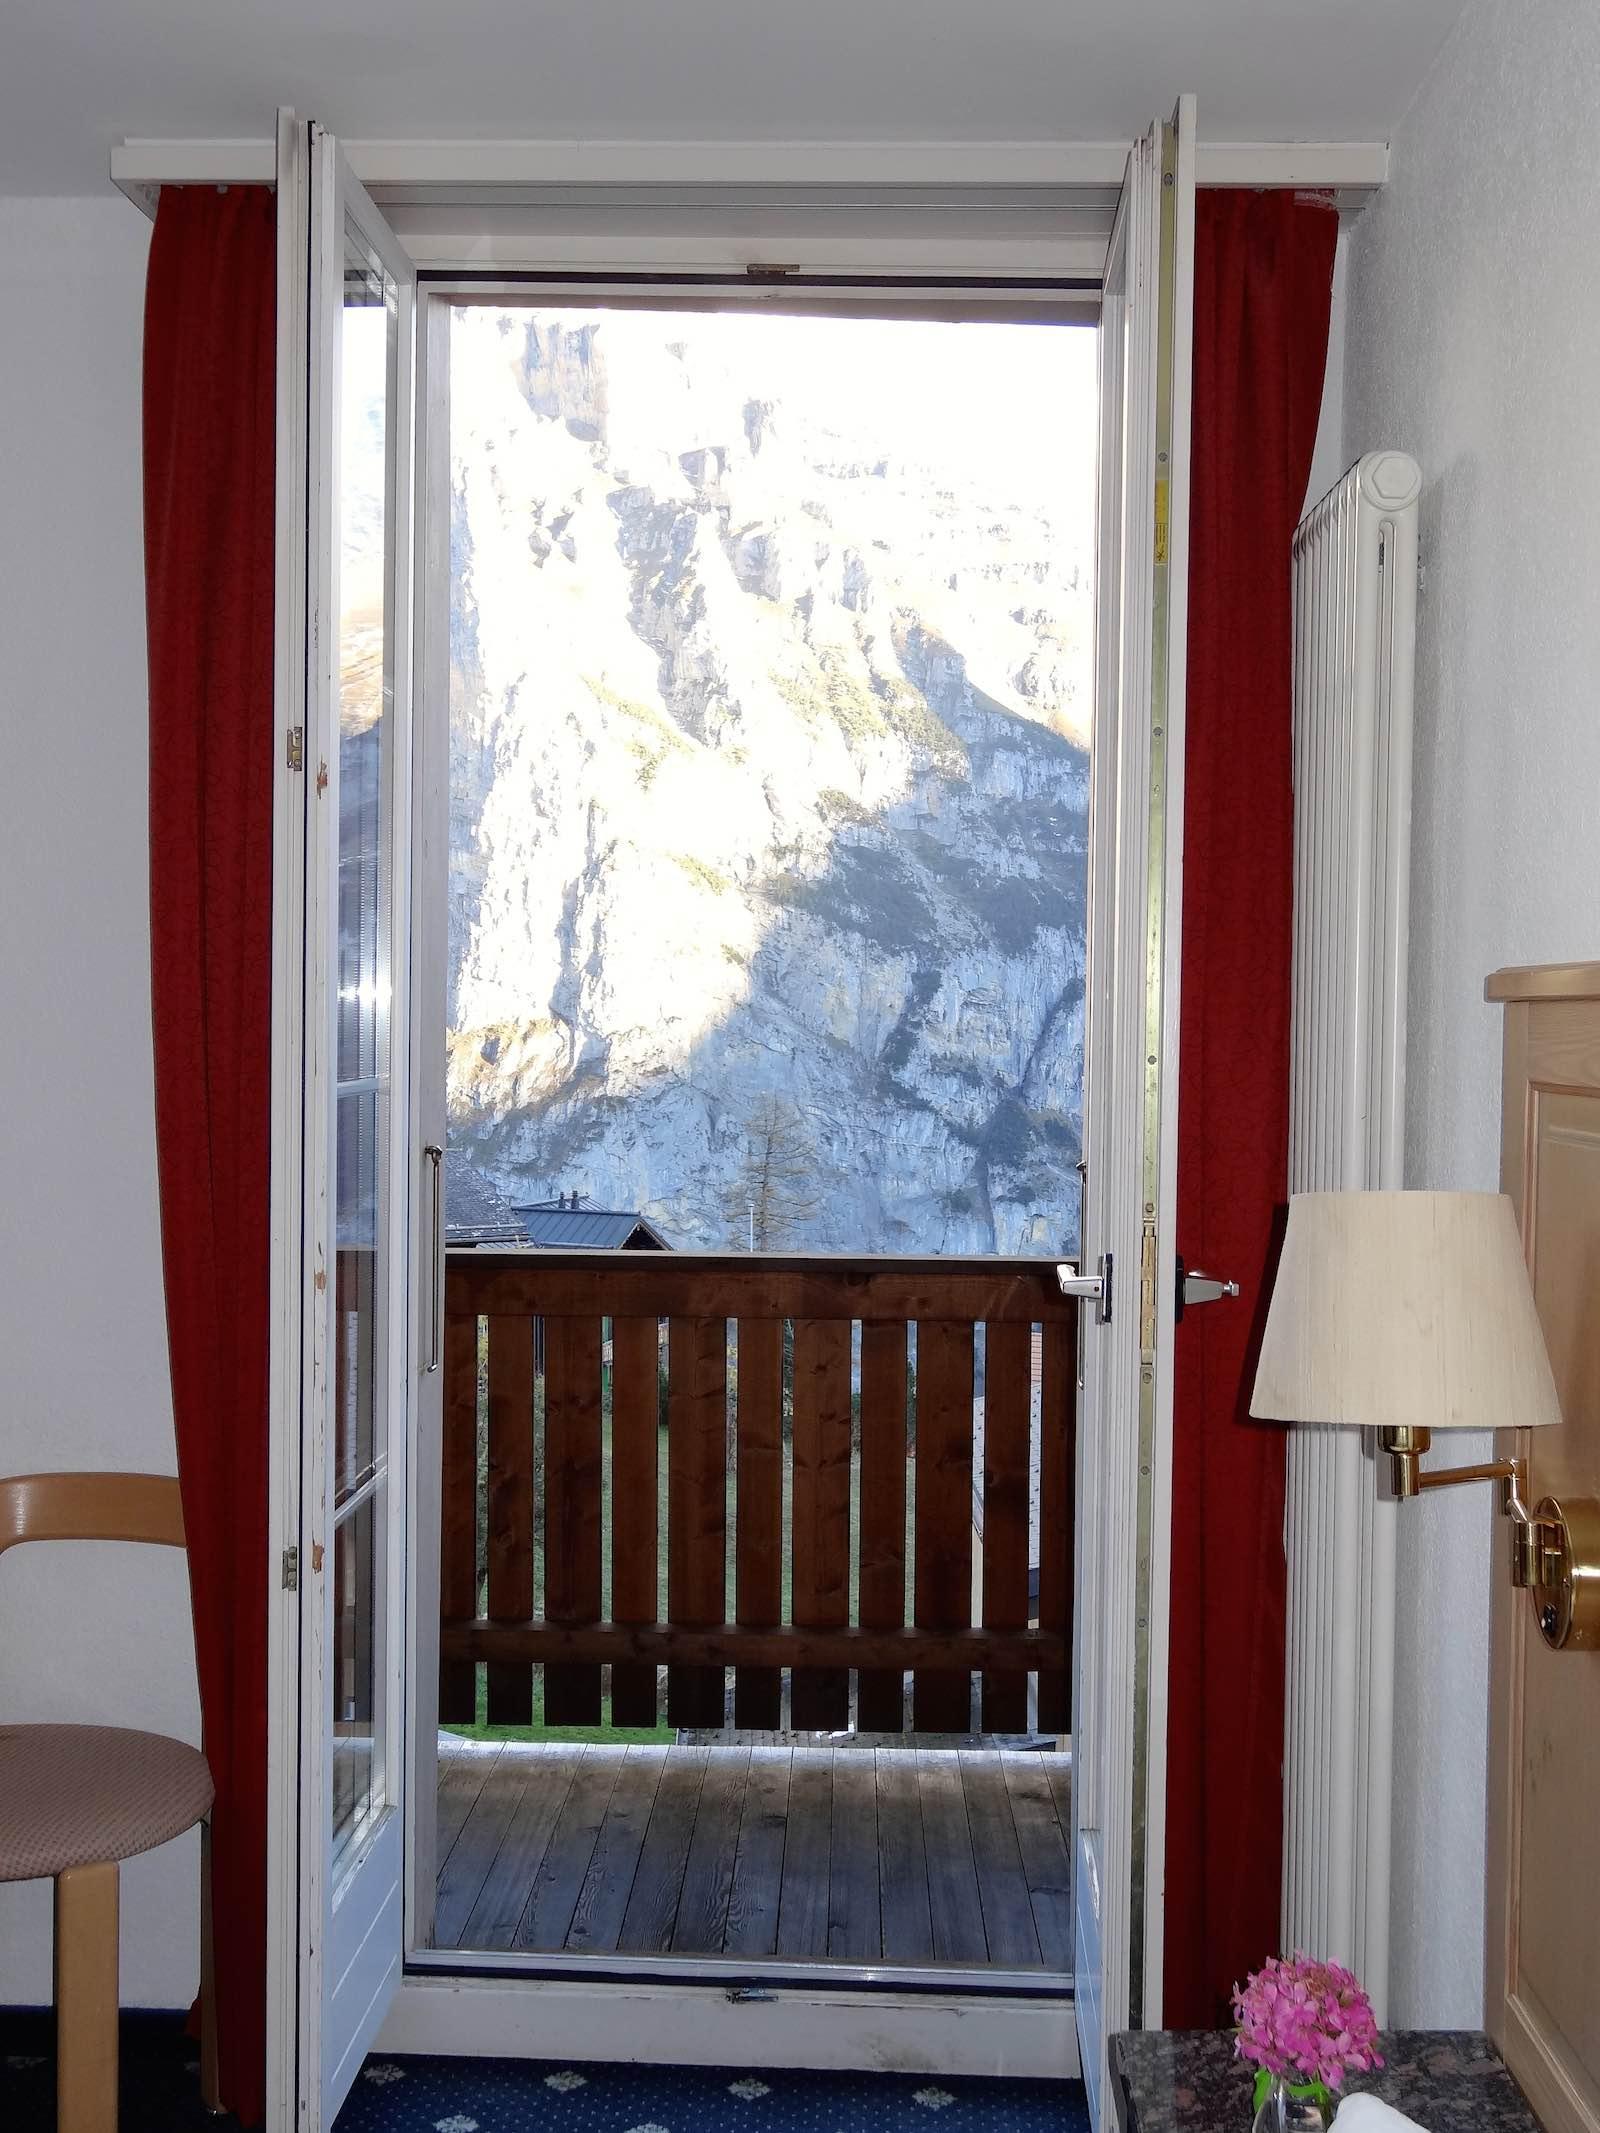 http://hoteljungfrau.ch/wp-content/uploads/2014/11/superior-zimmer-5.jpg